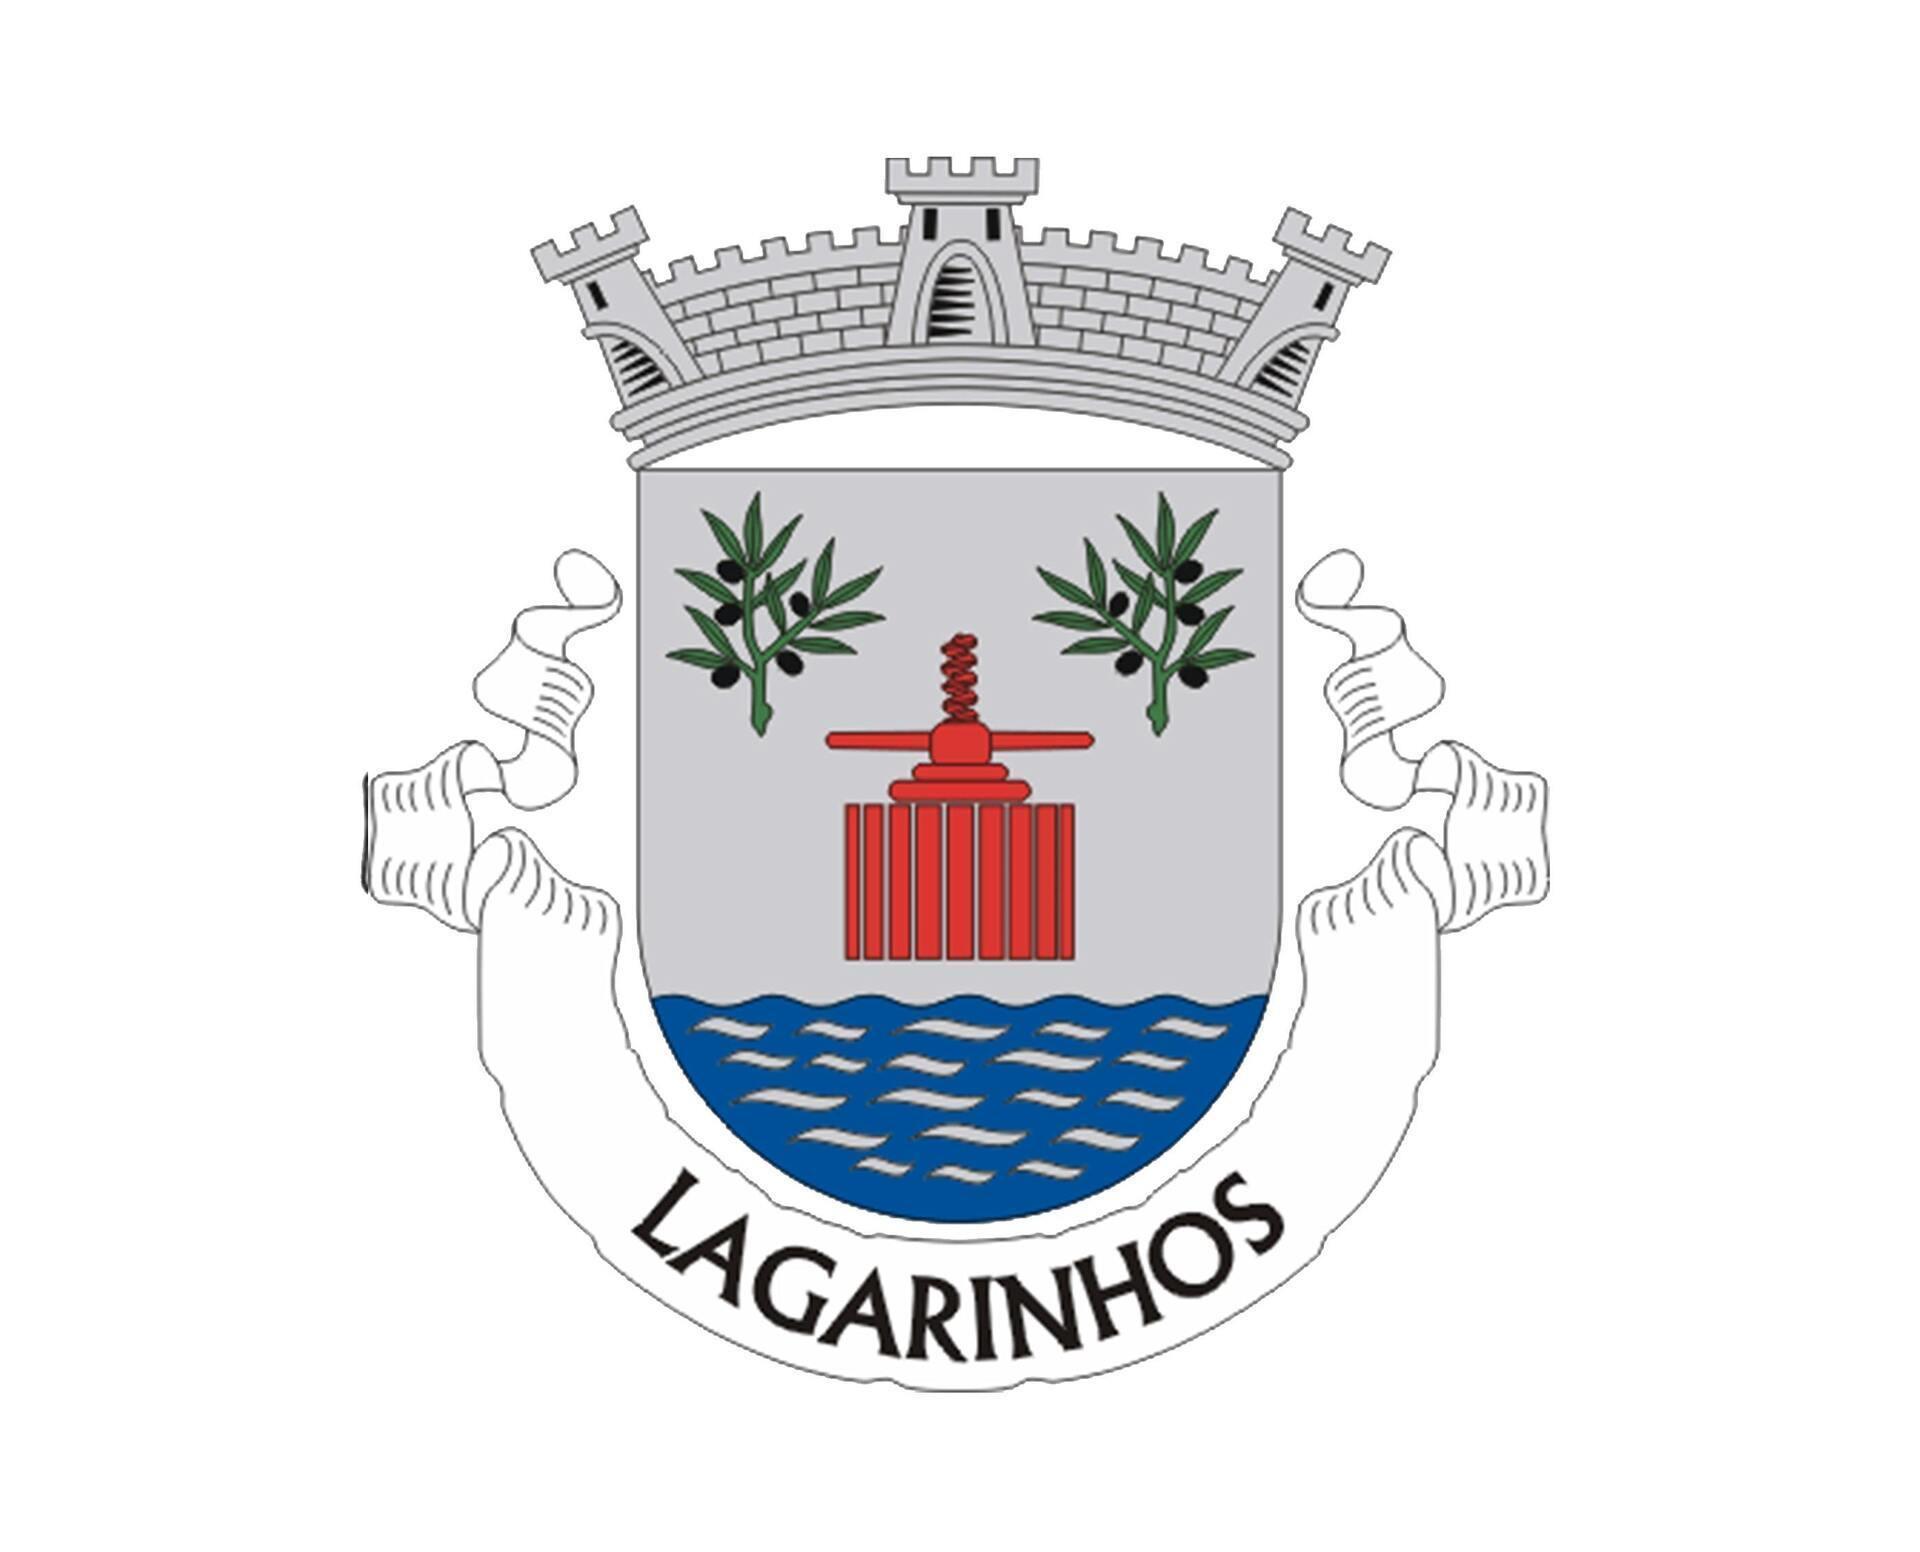 Brasão Lagarinhos